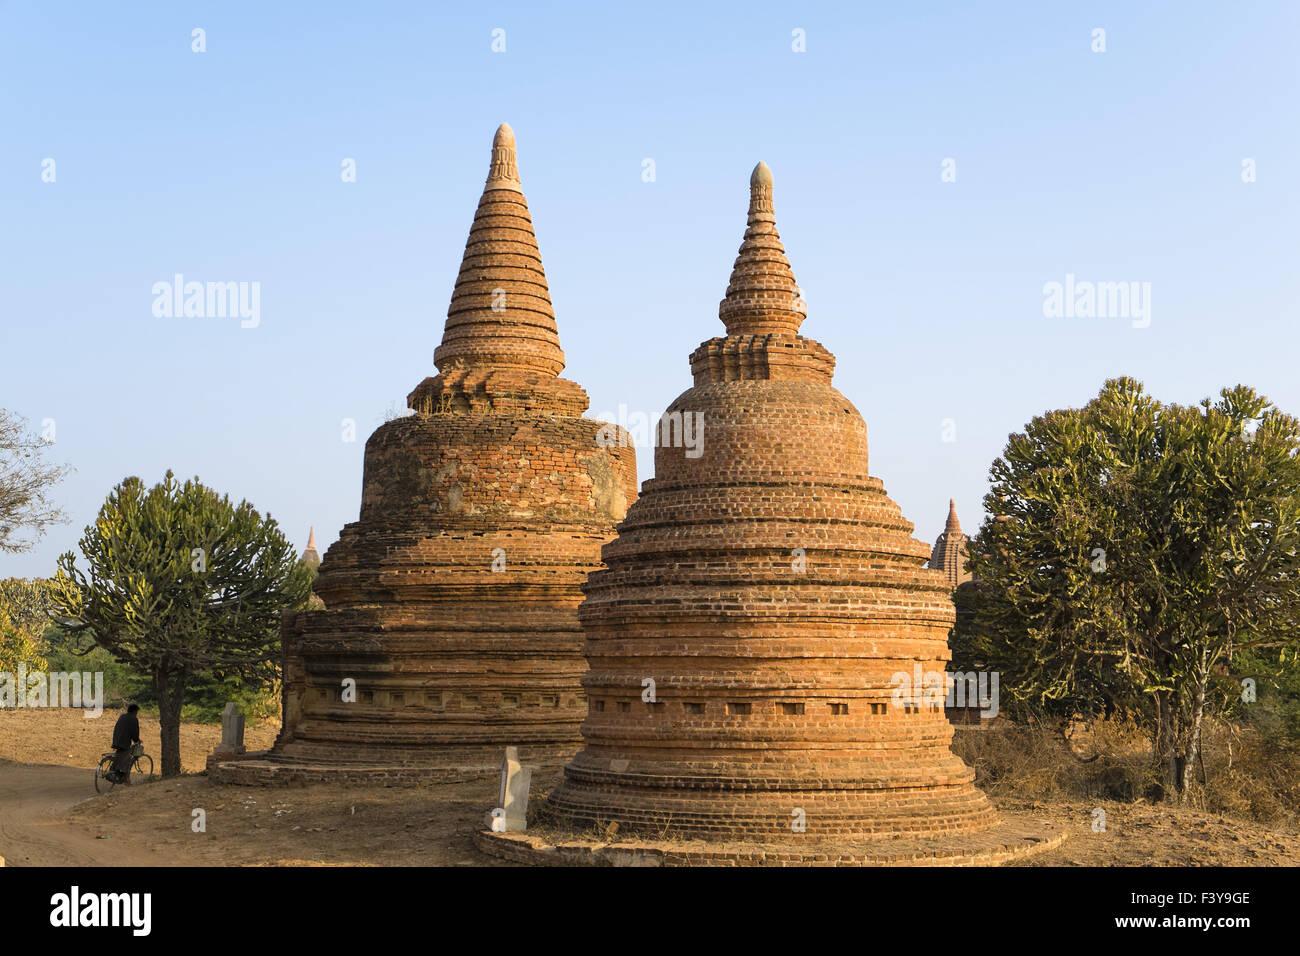 Stupas, Bagan, Myanmar, Asia Stock Photo